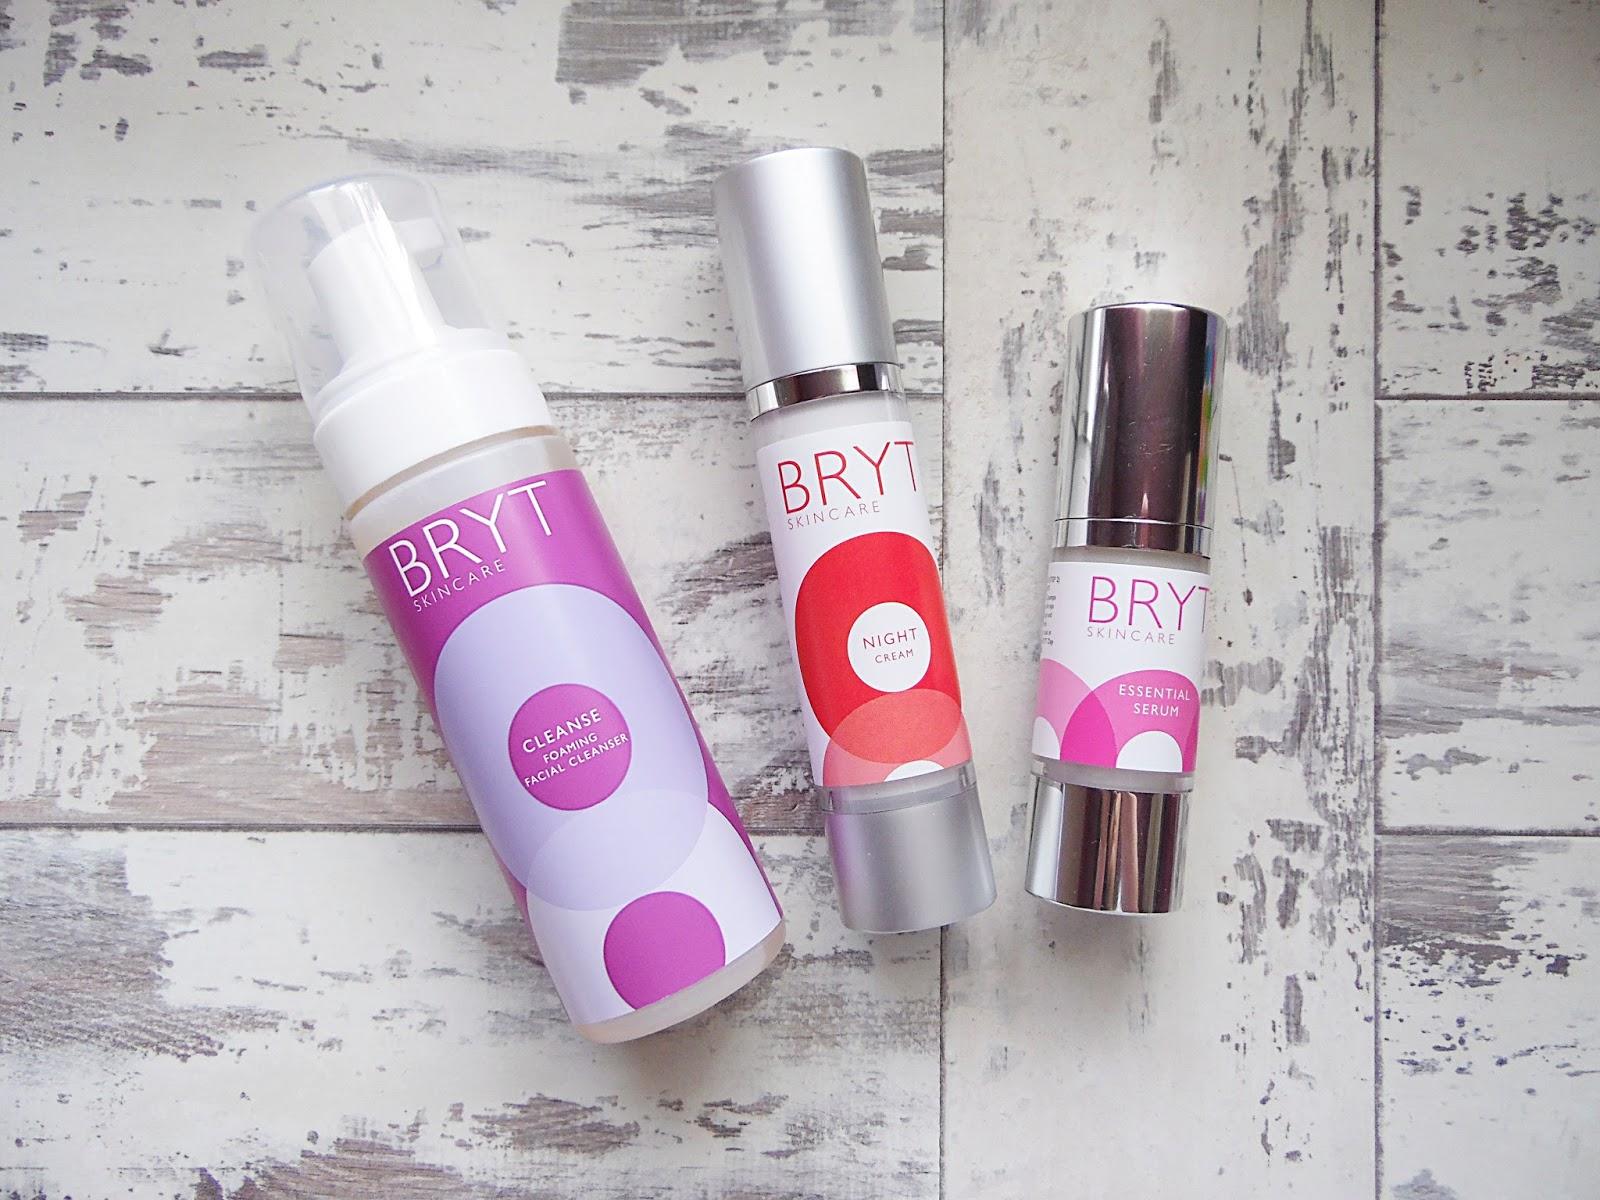 BRYT Skincare